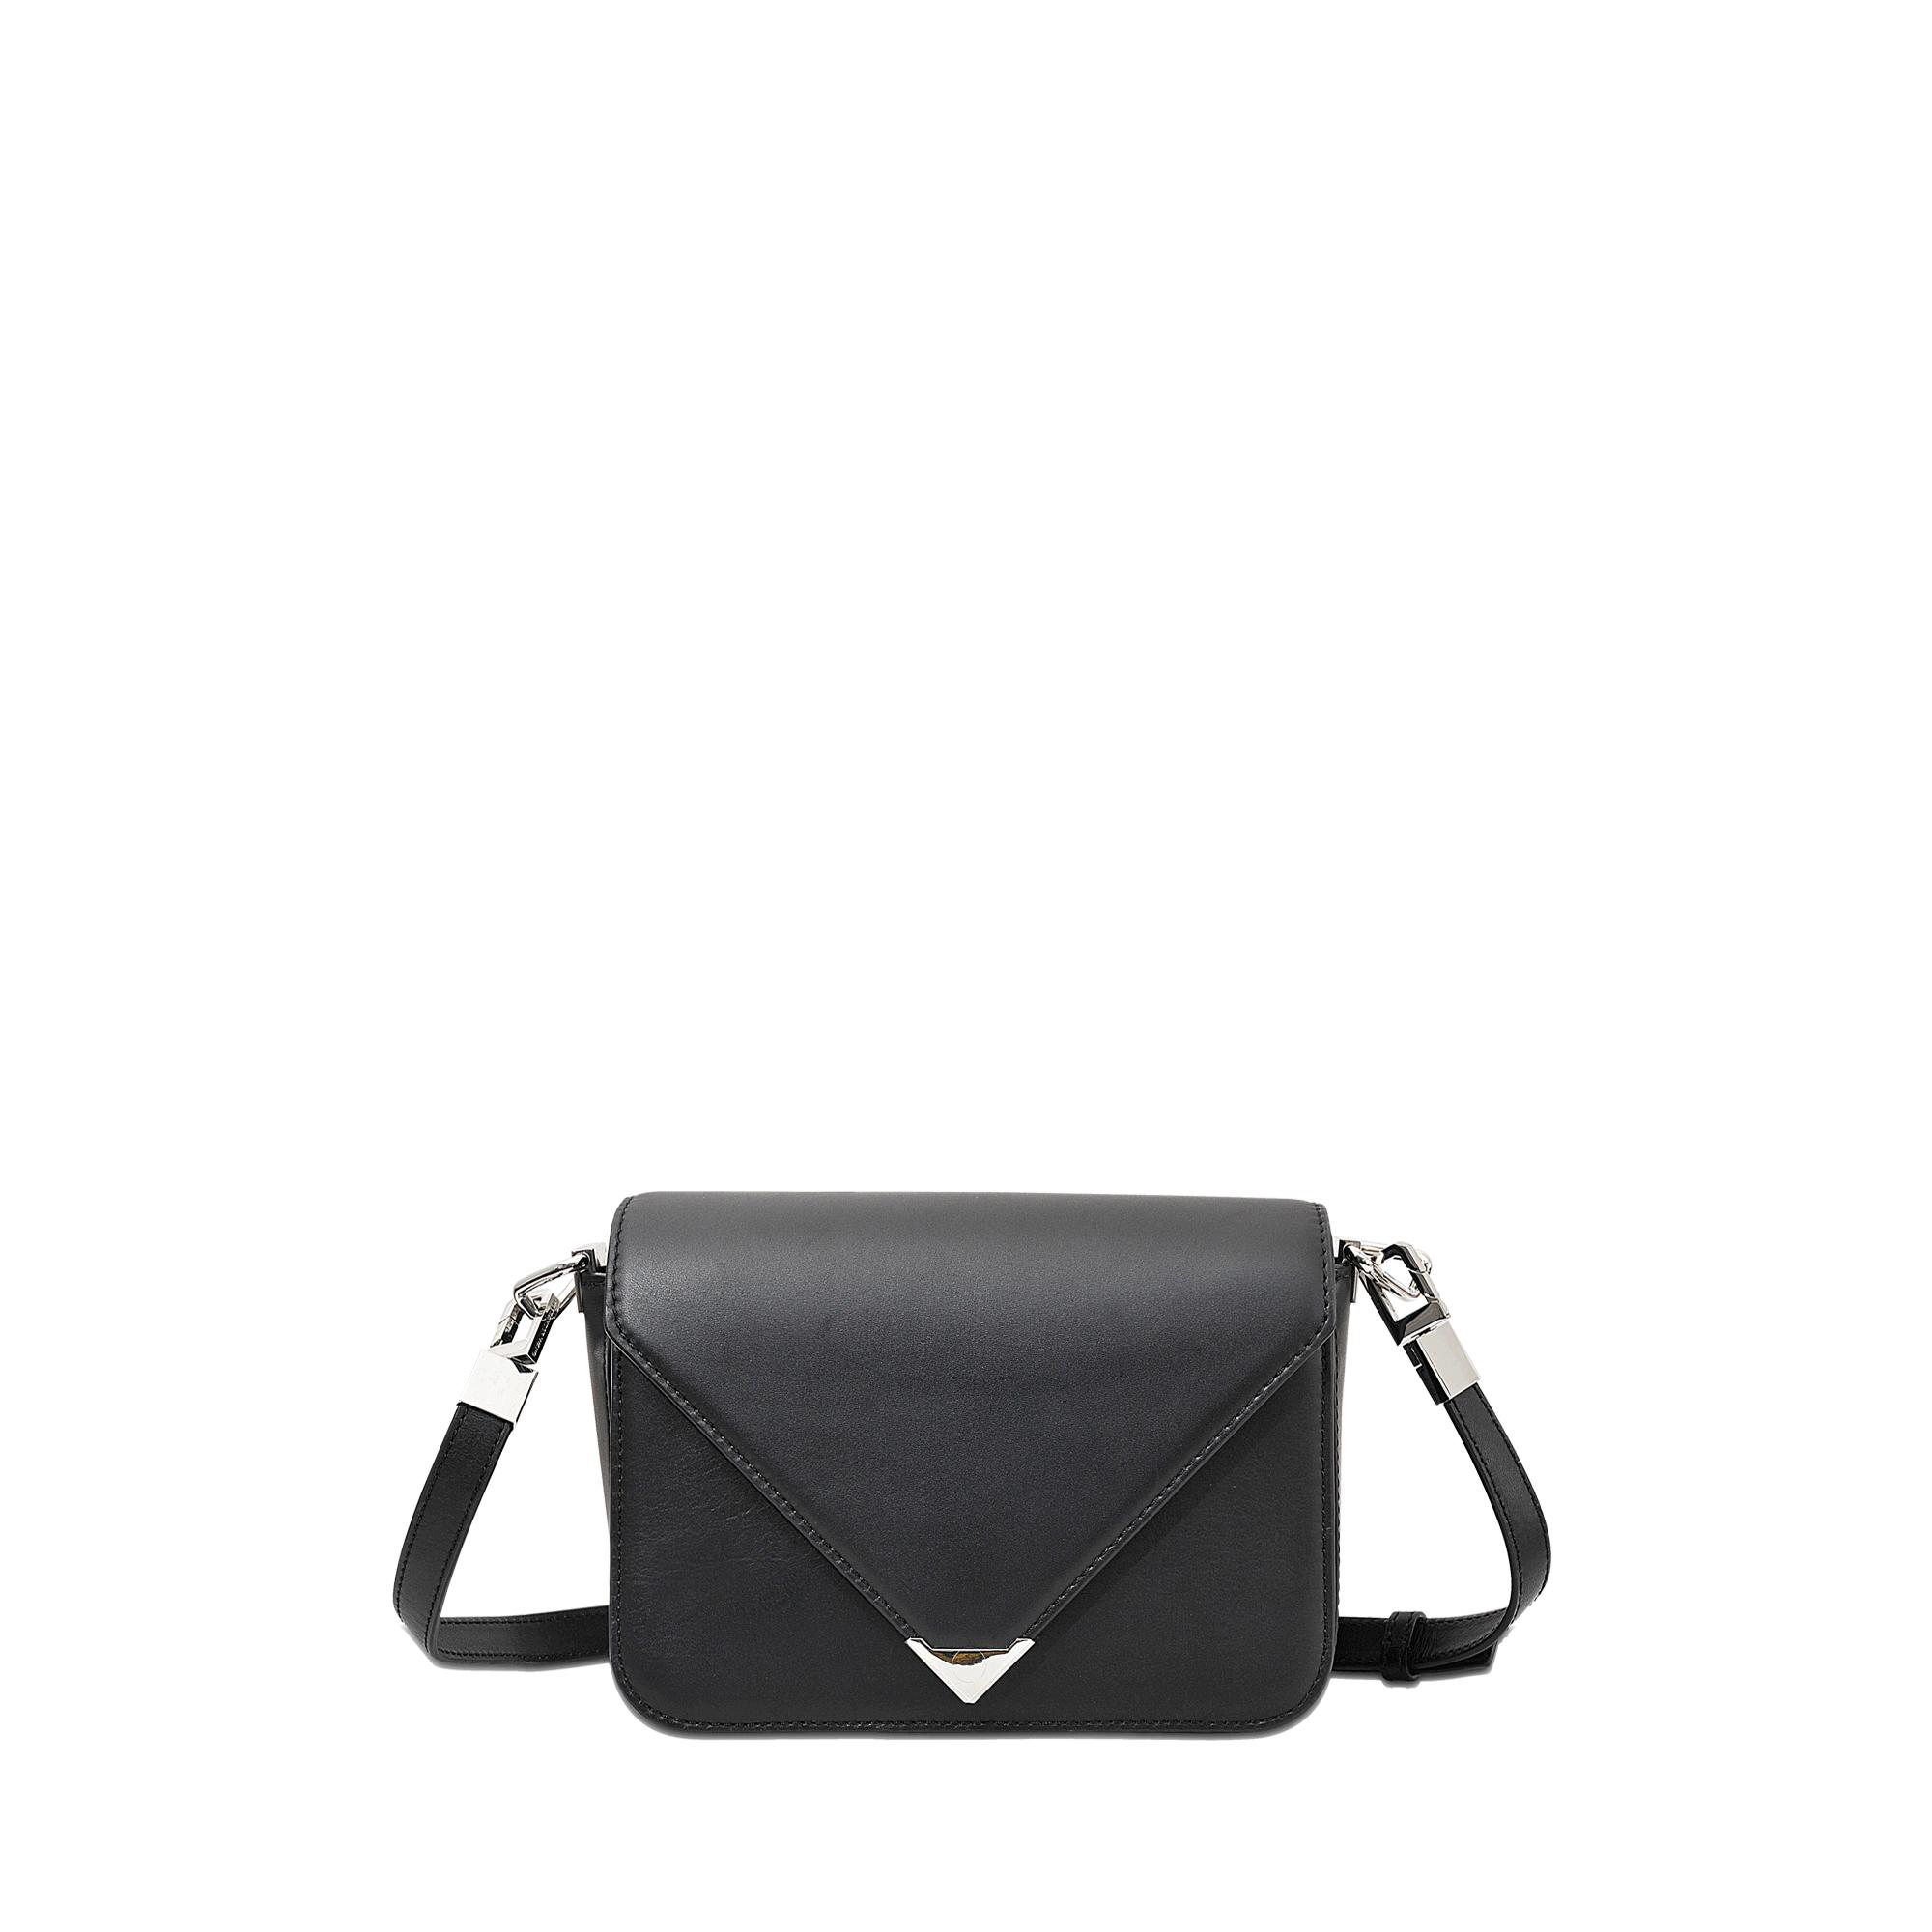 Alexander wang Prisma Envelope Small Sling Flap Bag in Black | Lyst